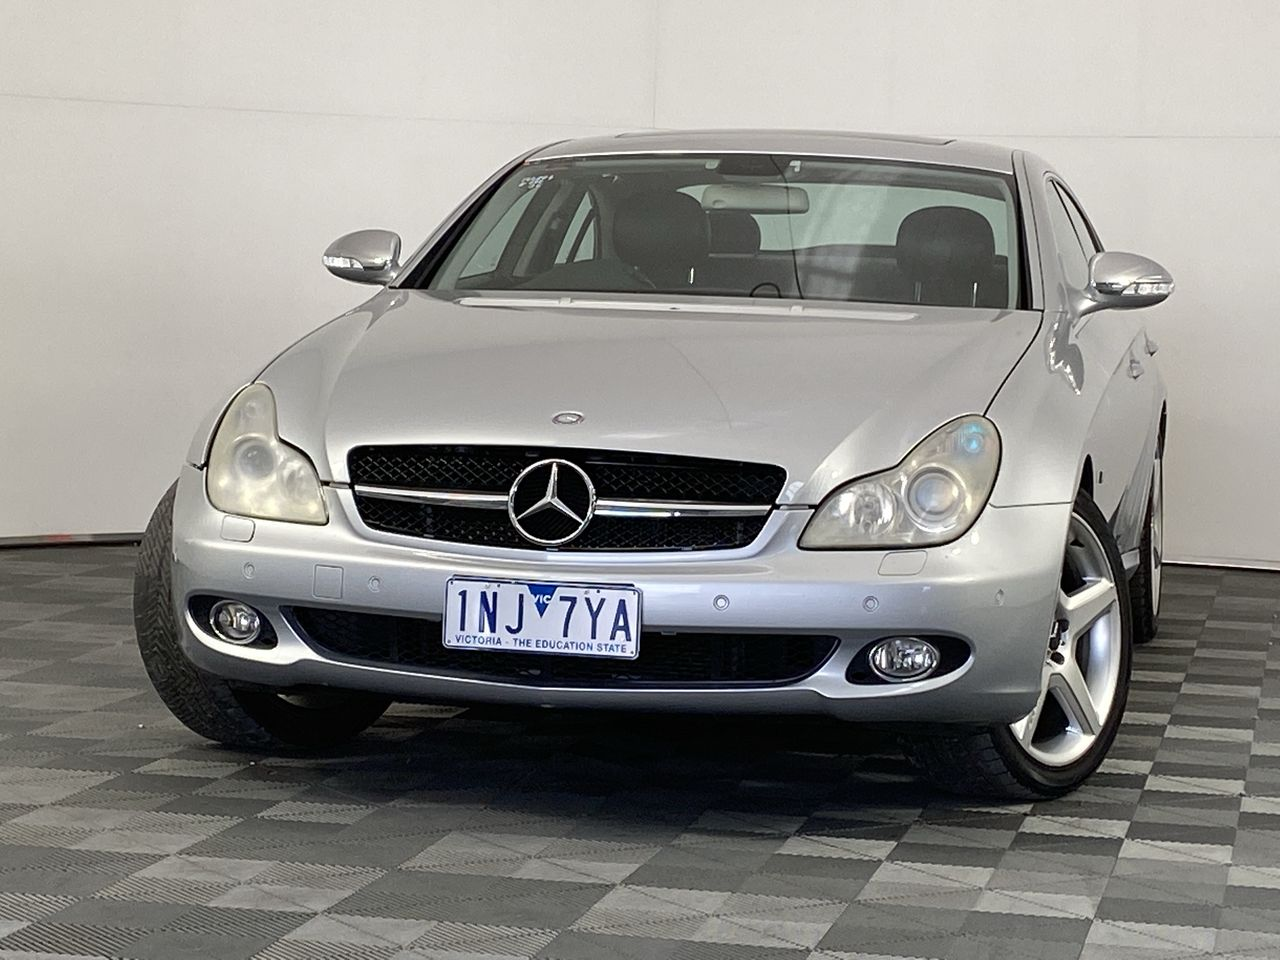 2005 Mercedes Benz CLS-Class CLS 500 C219 Automatic Coupe